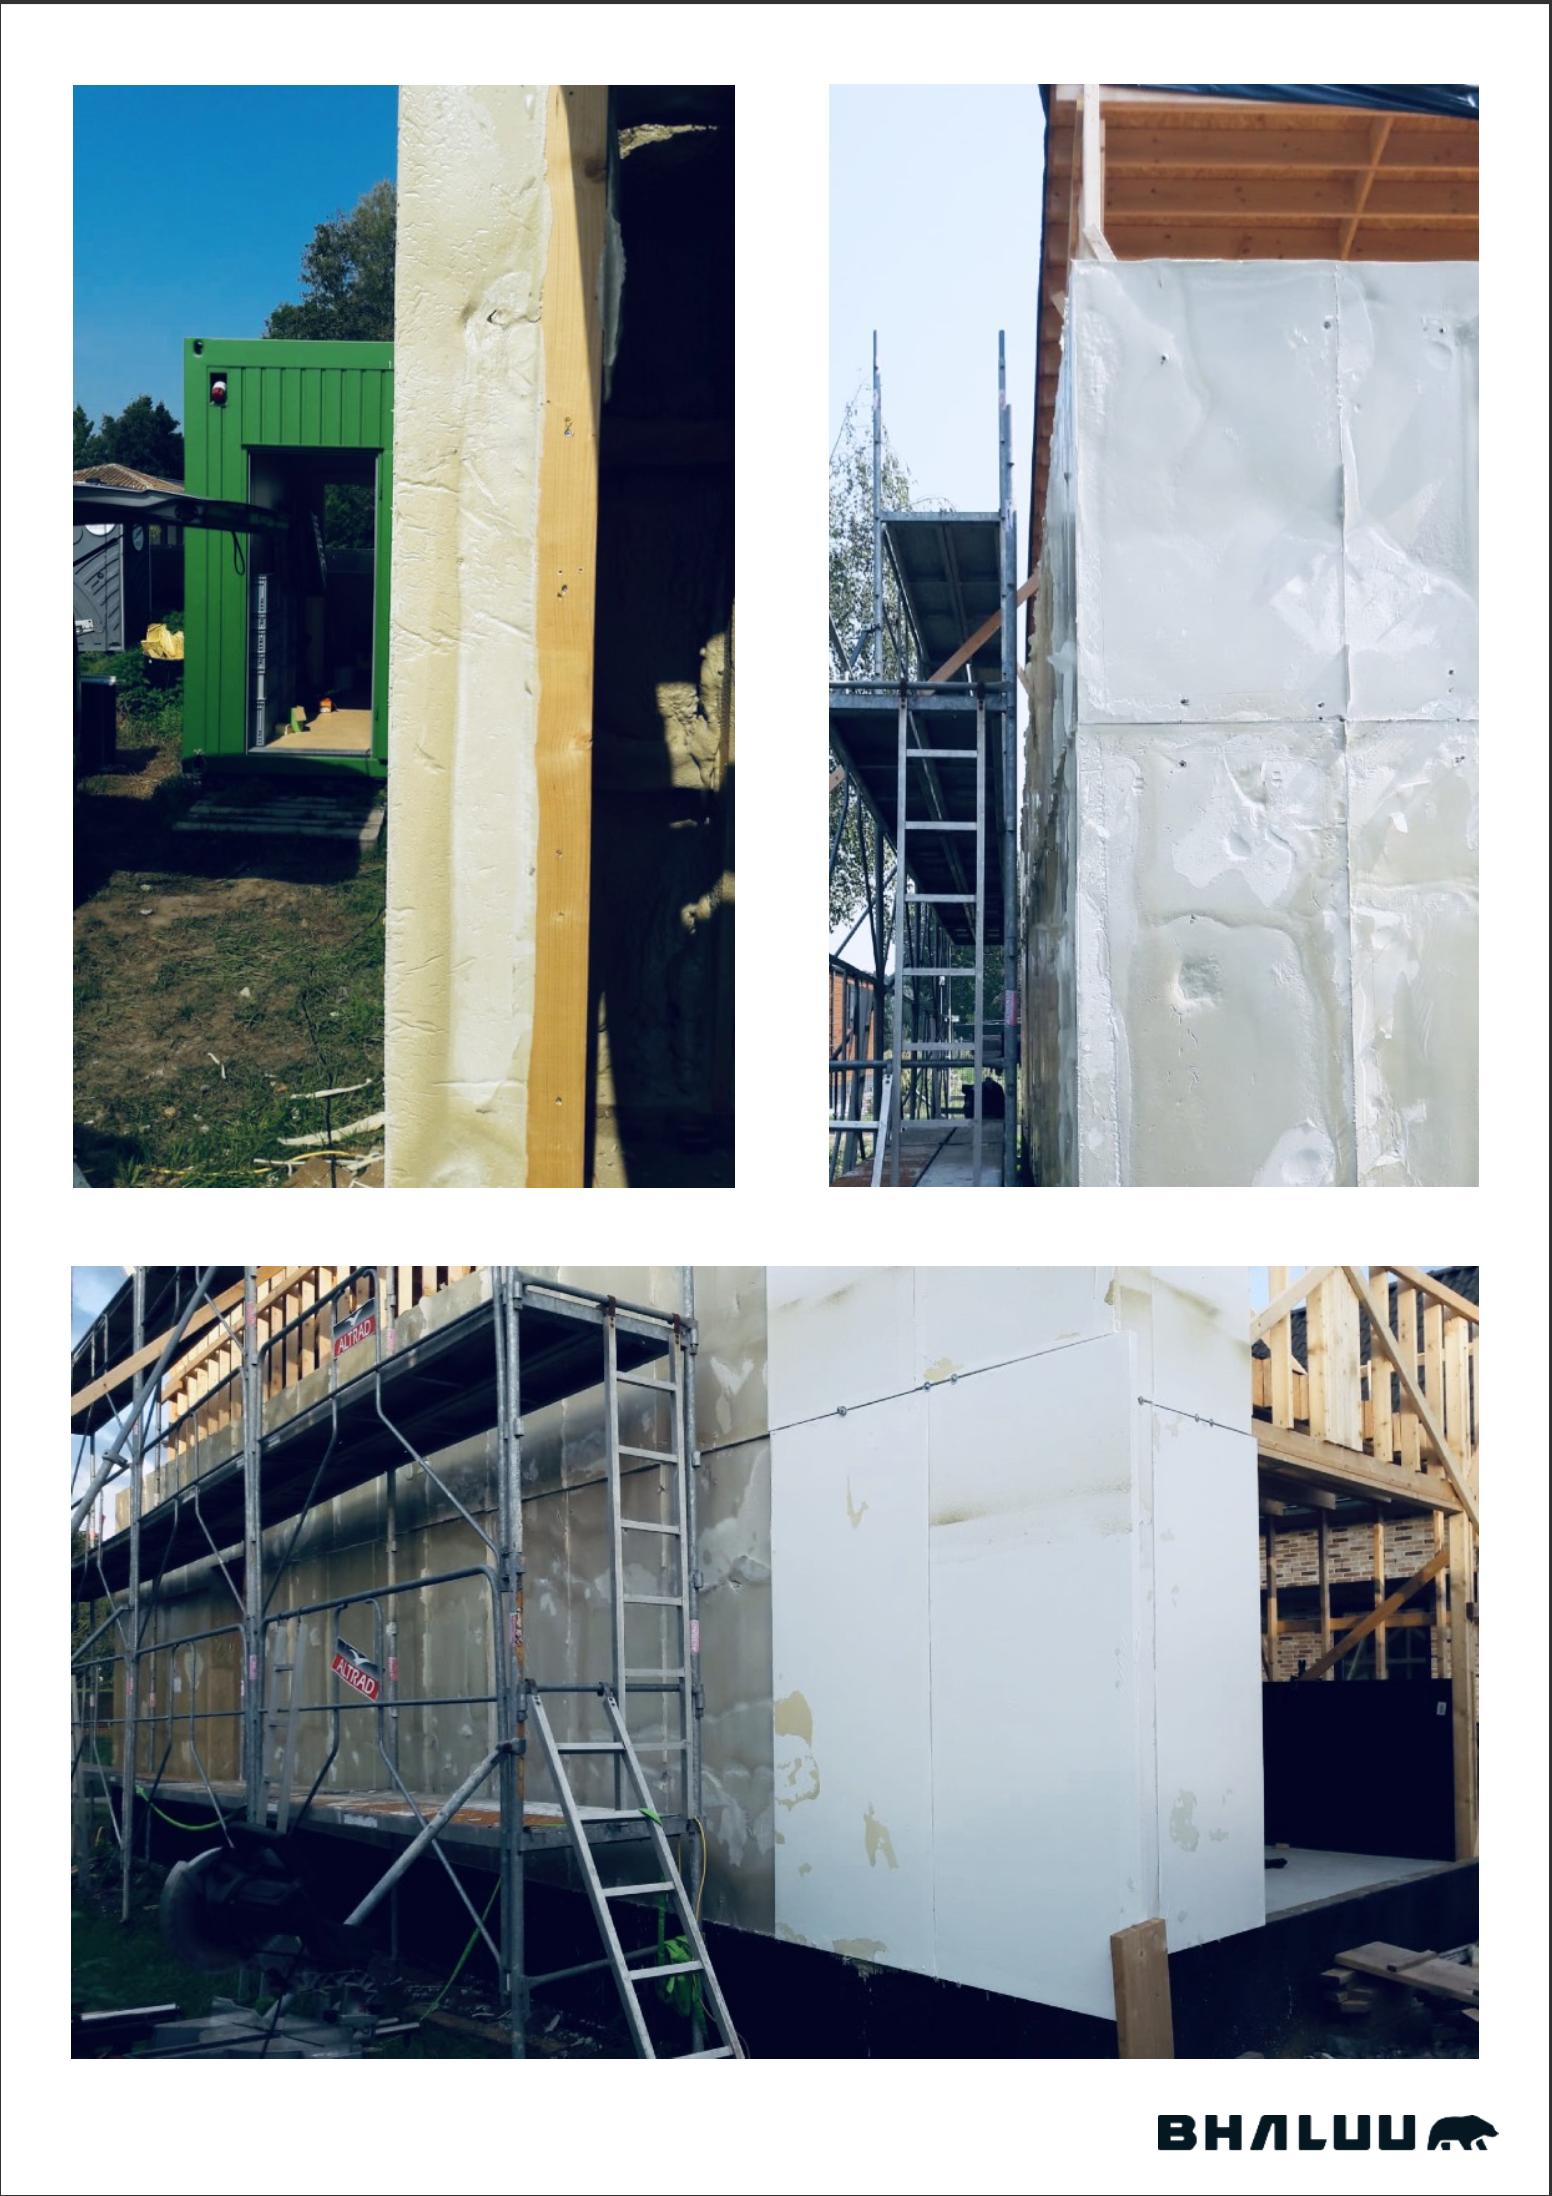 Gallery Bhaluu Constructions 3